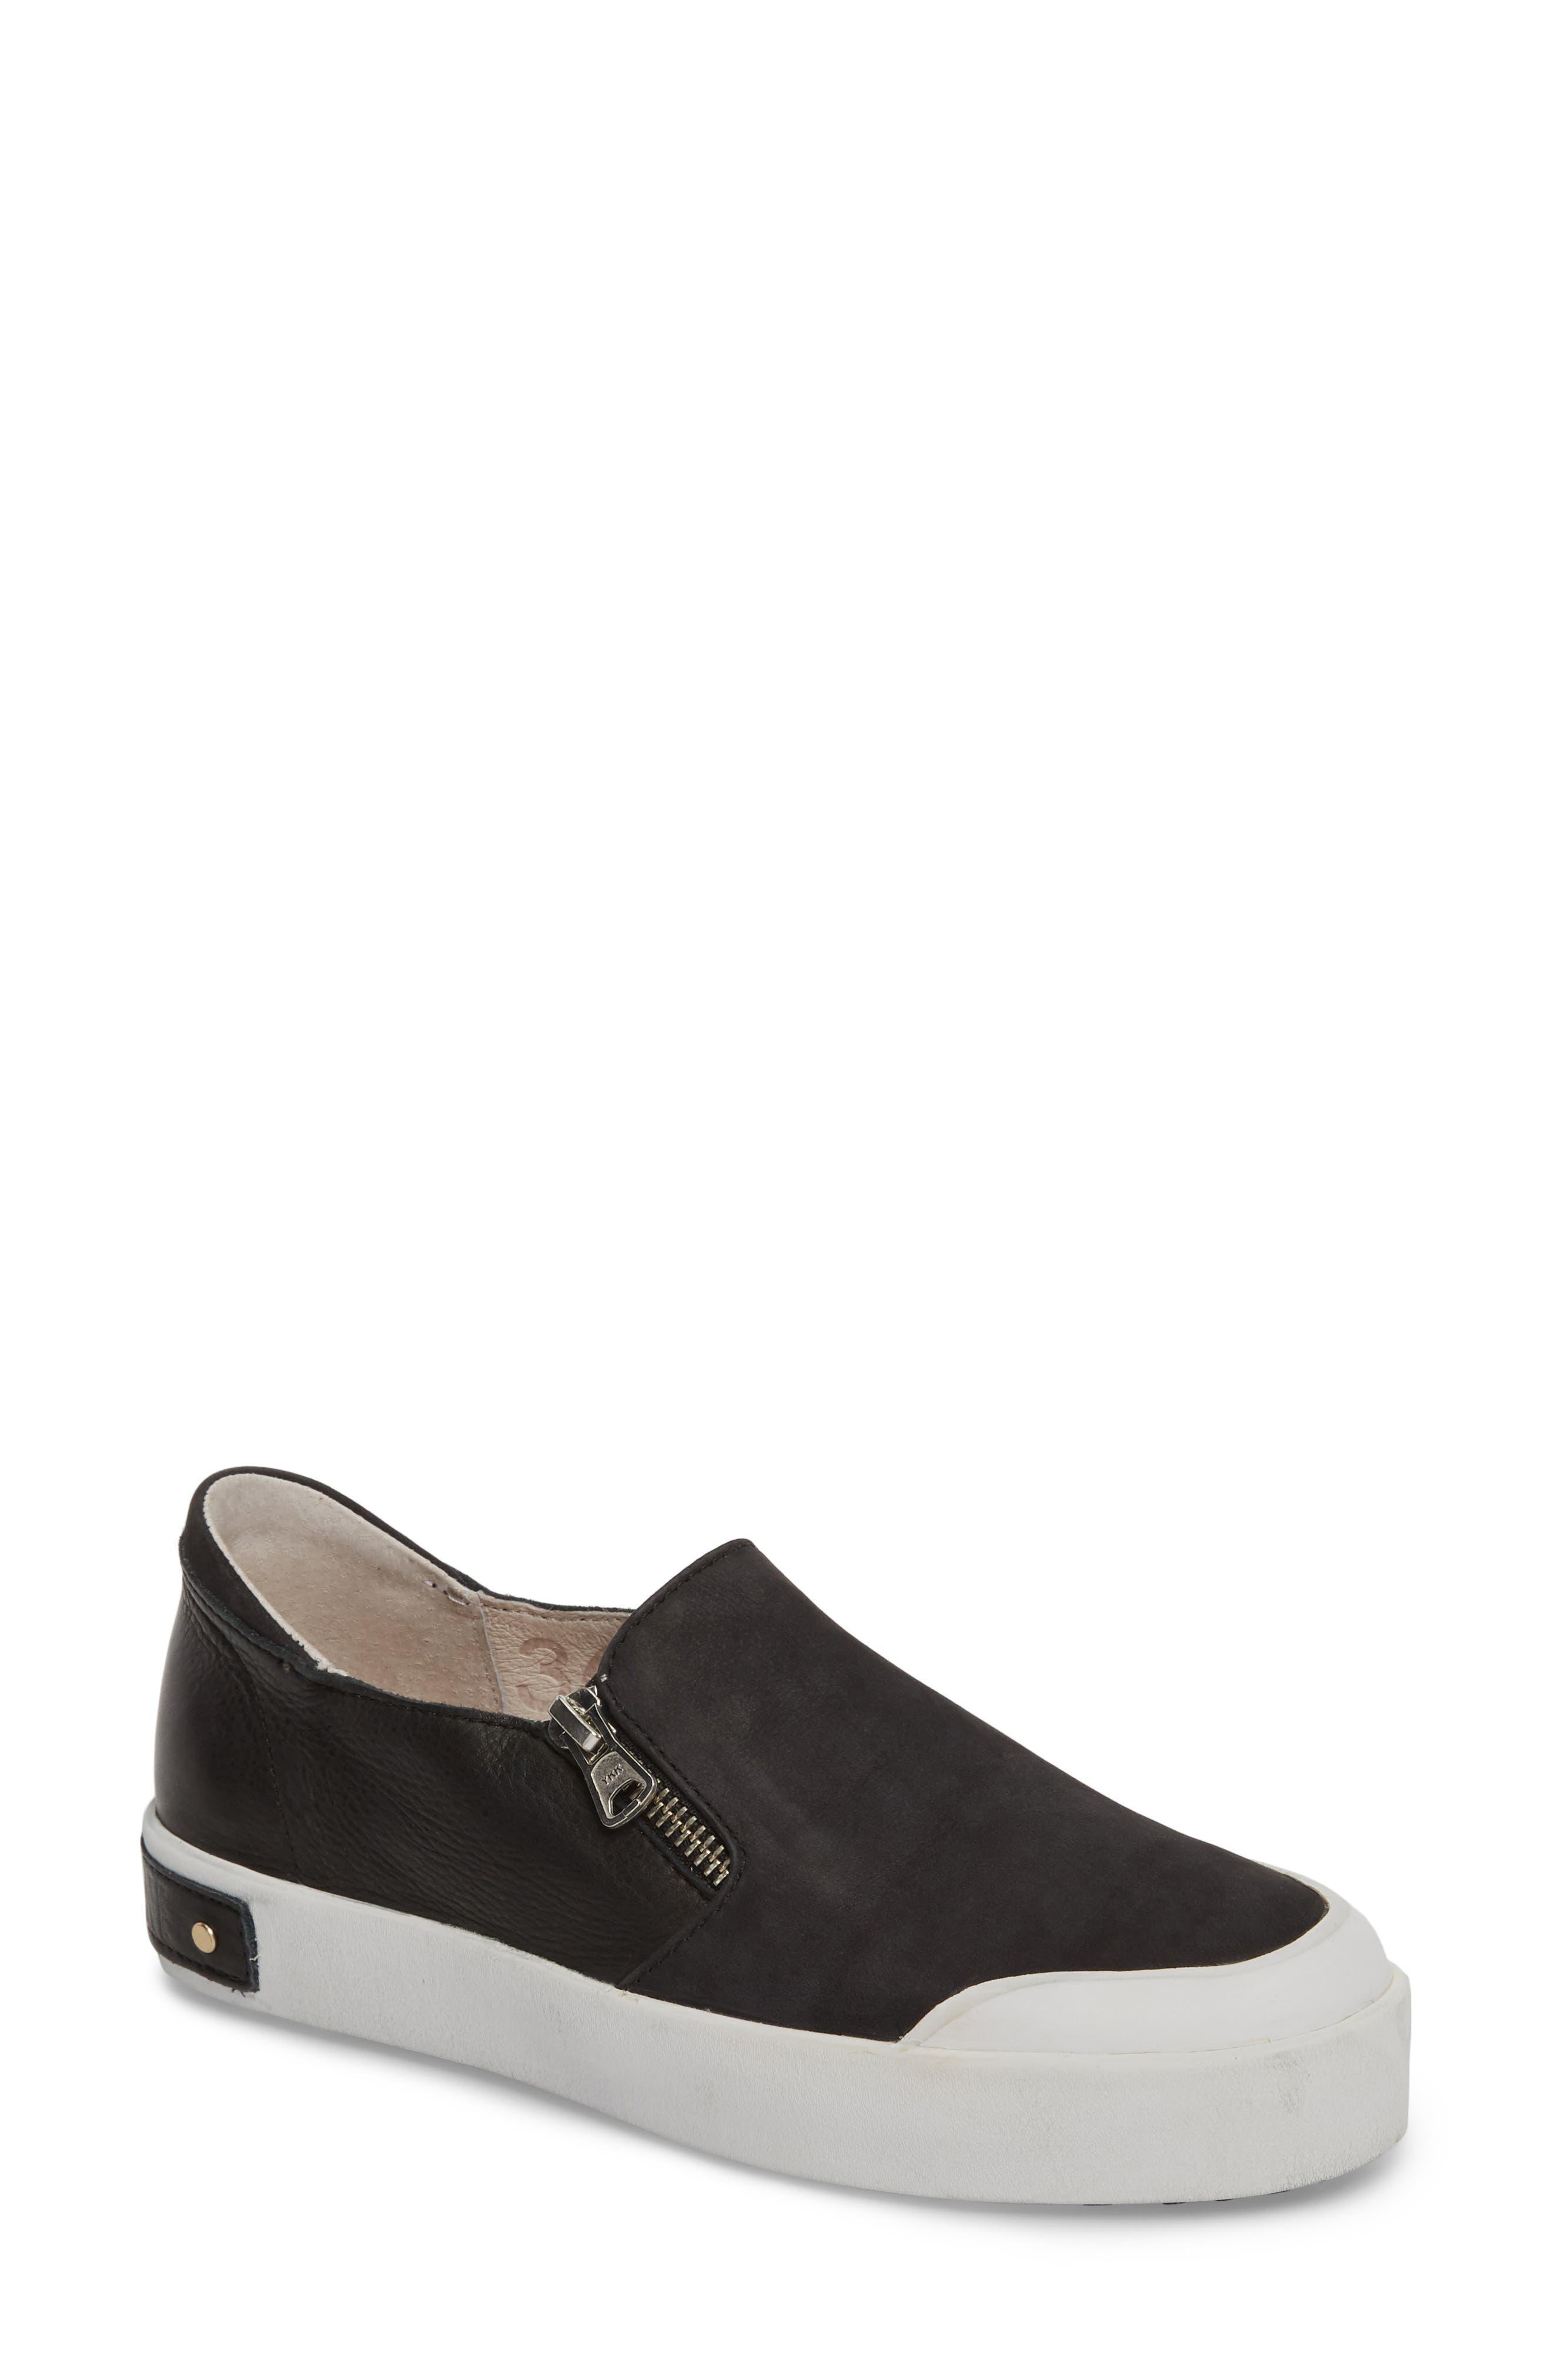 PL82 Slip-On Sneaker,                             Main thumbnail 1, color,                             BLACK LEATHER